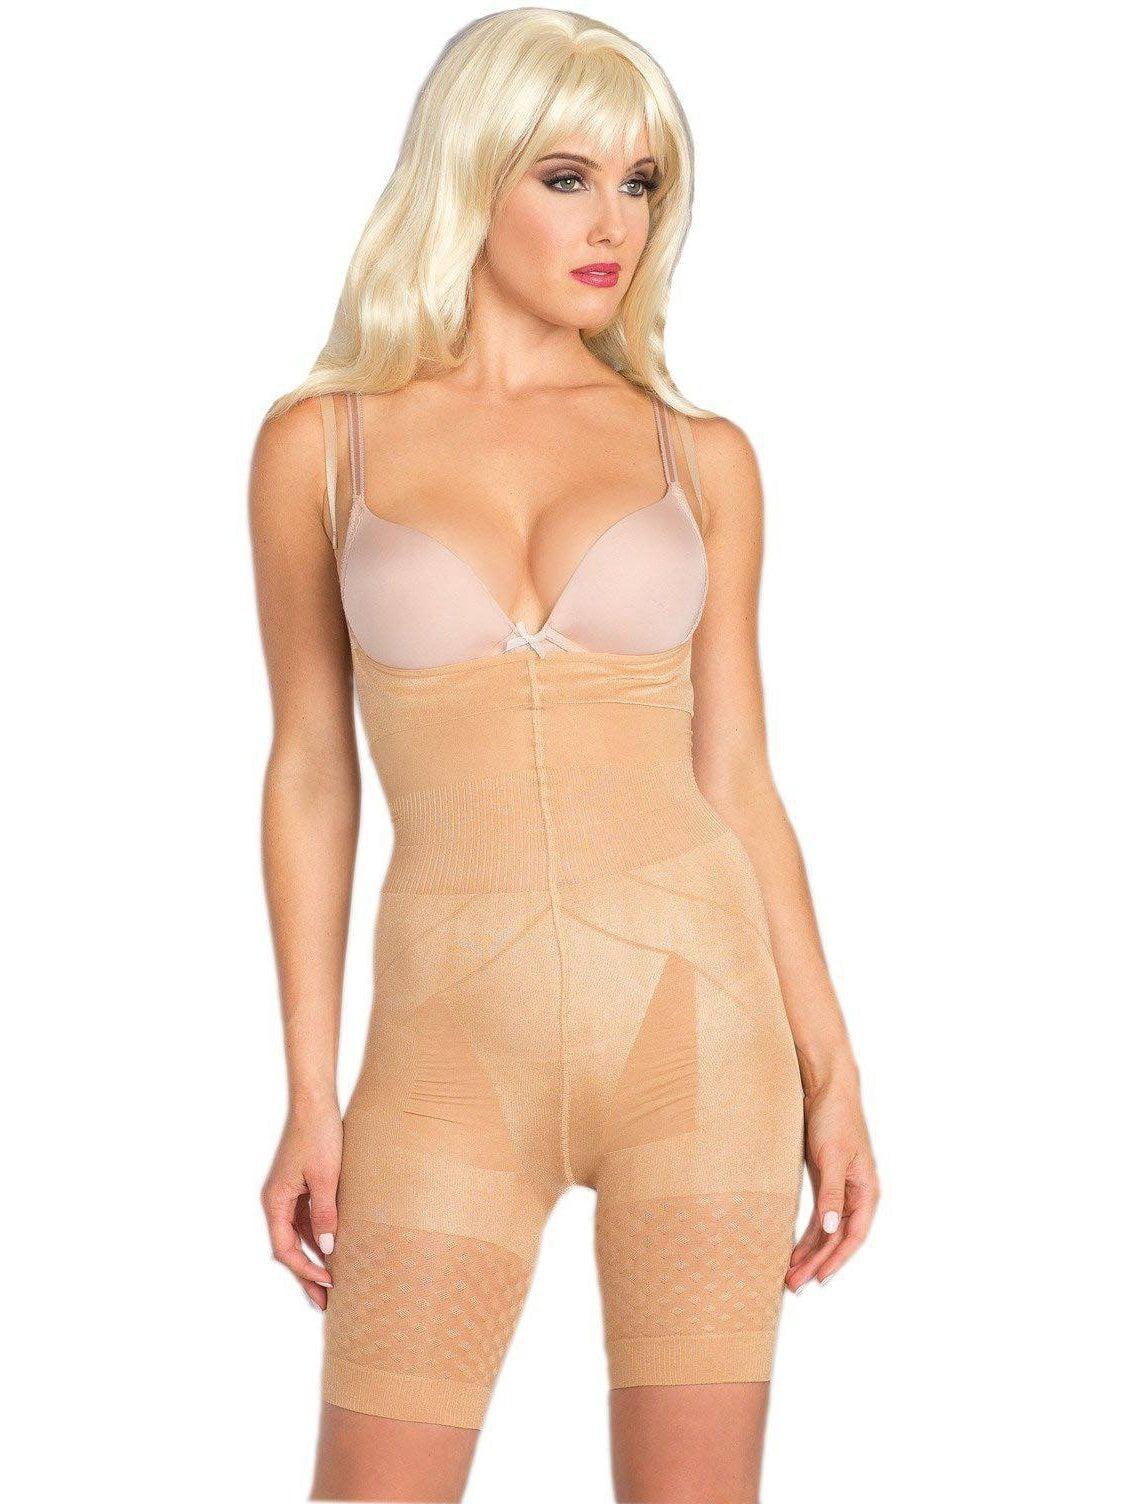 Seamless tummy control high waist body shaper blacknude slip half dress panty